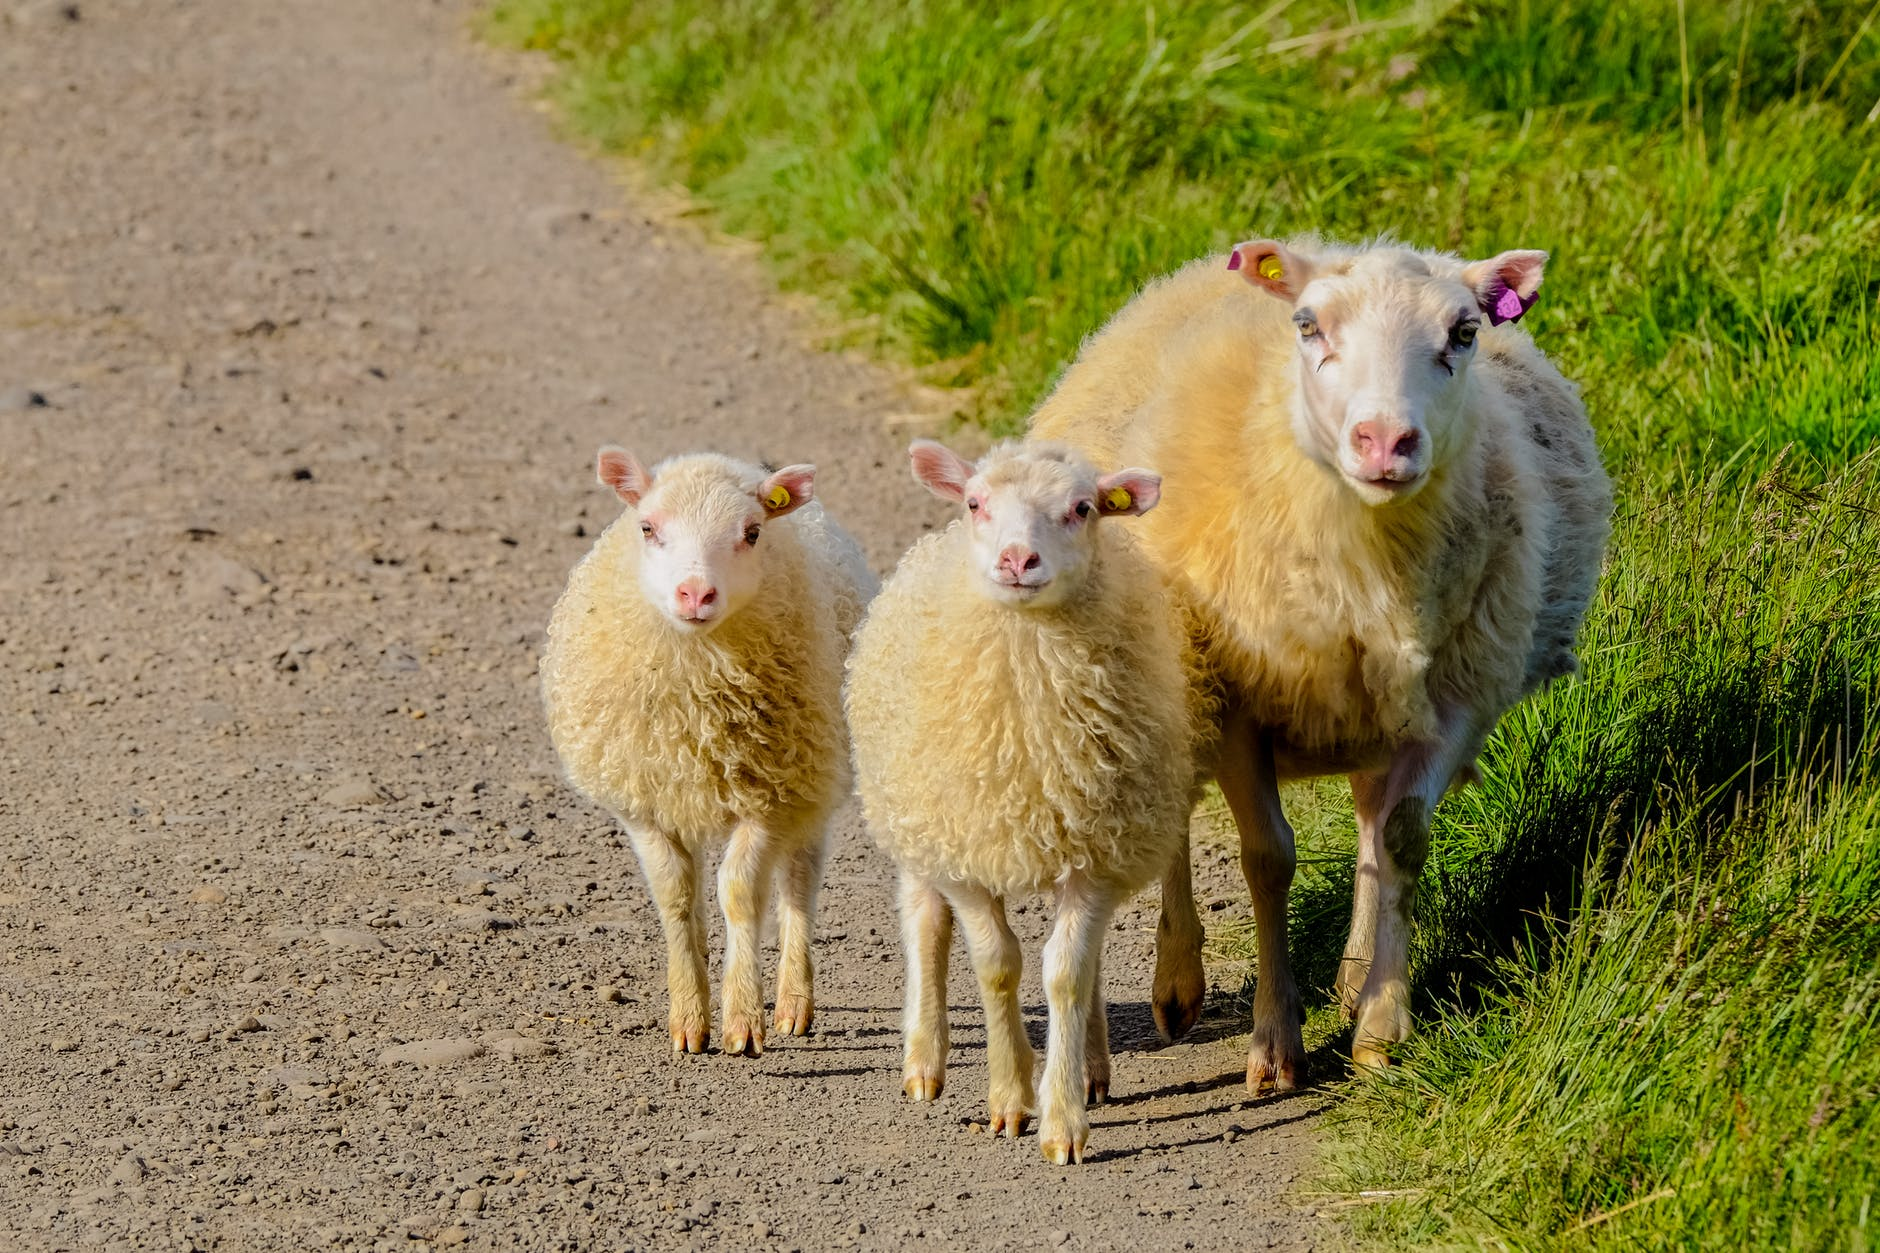 animal animal photography countryside cute